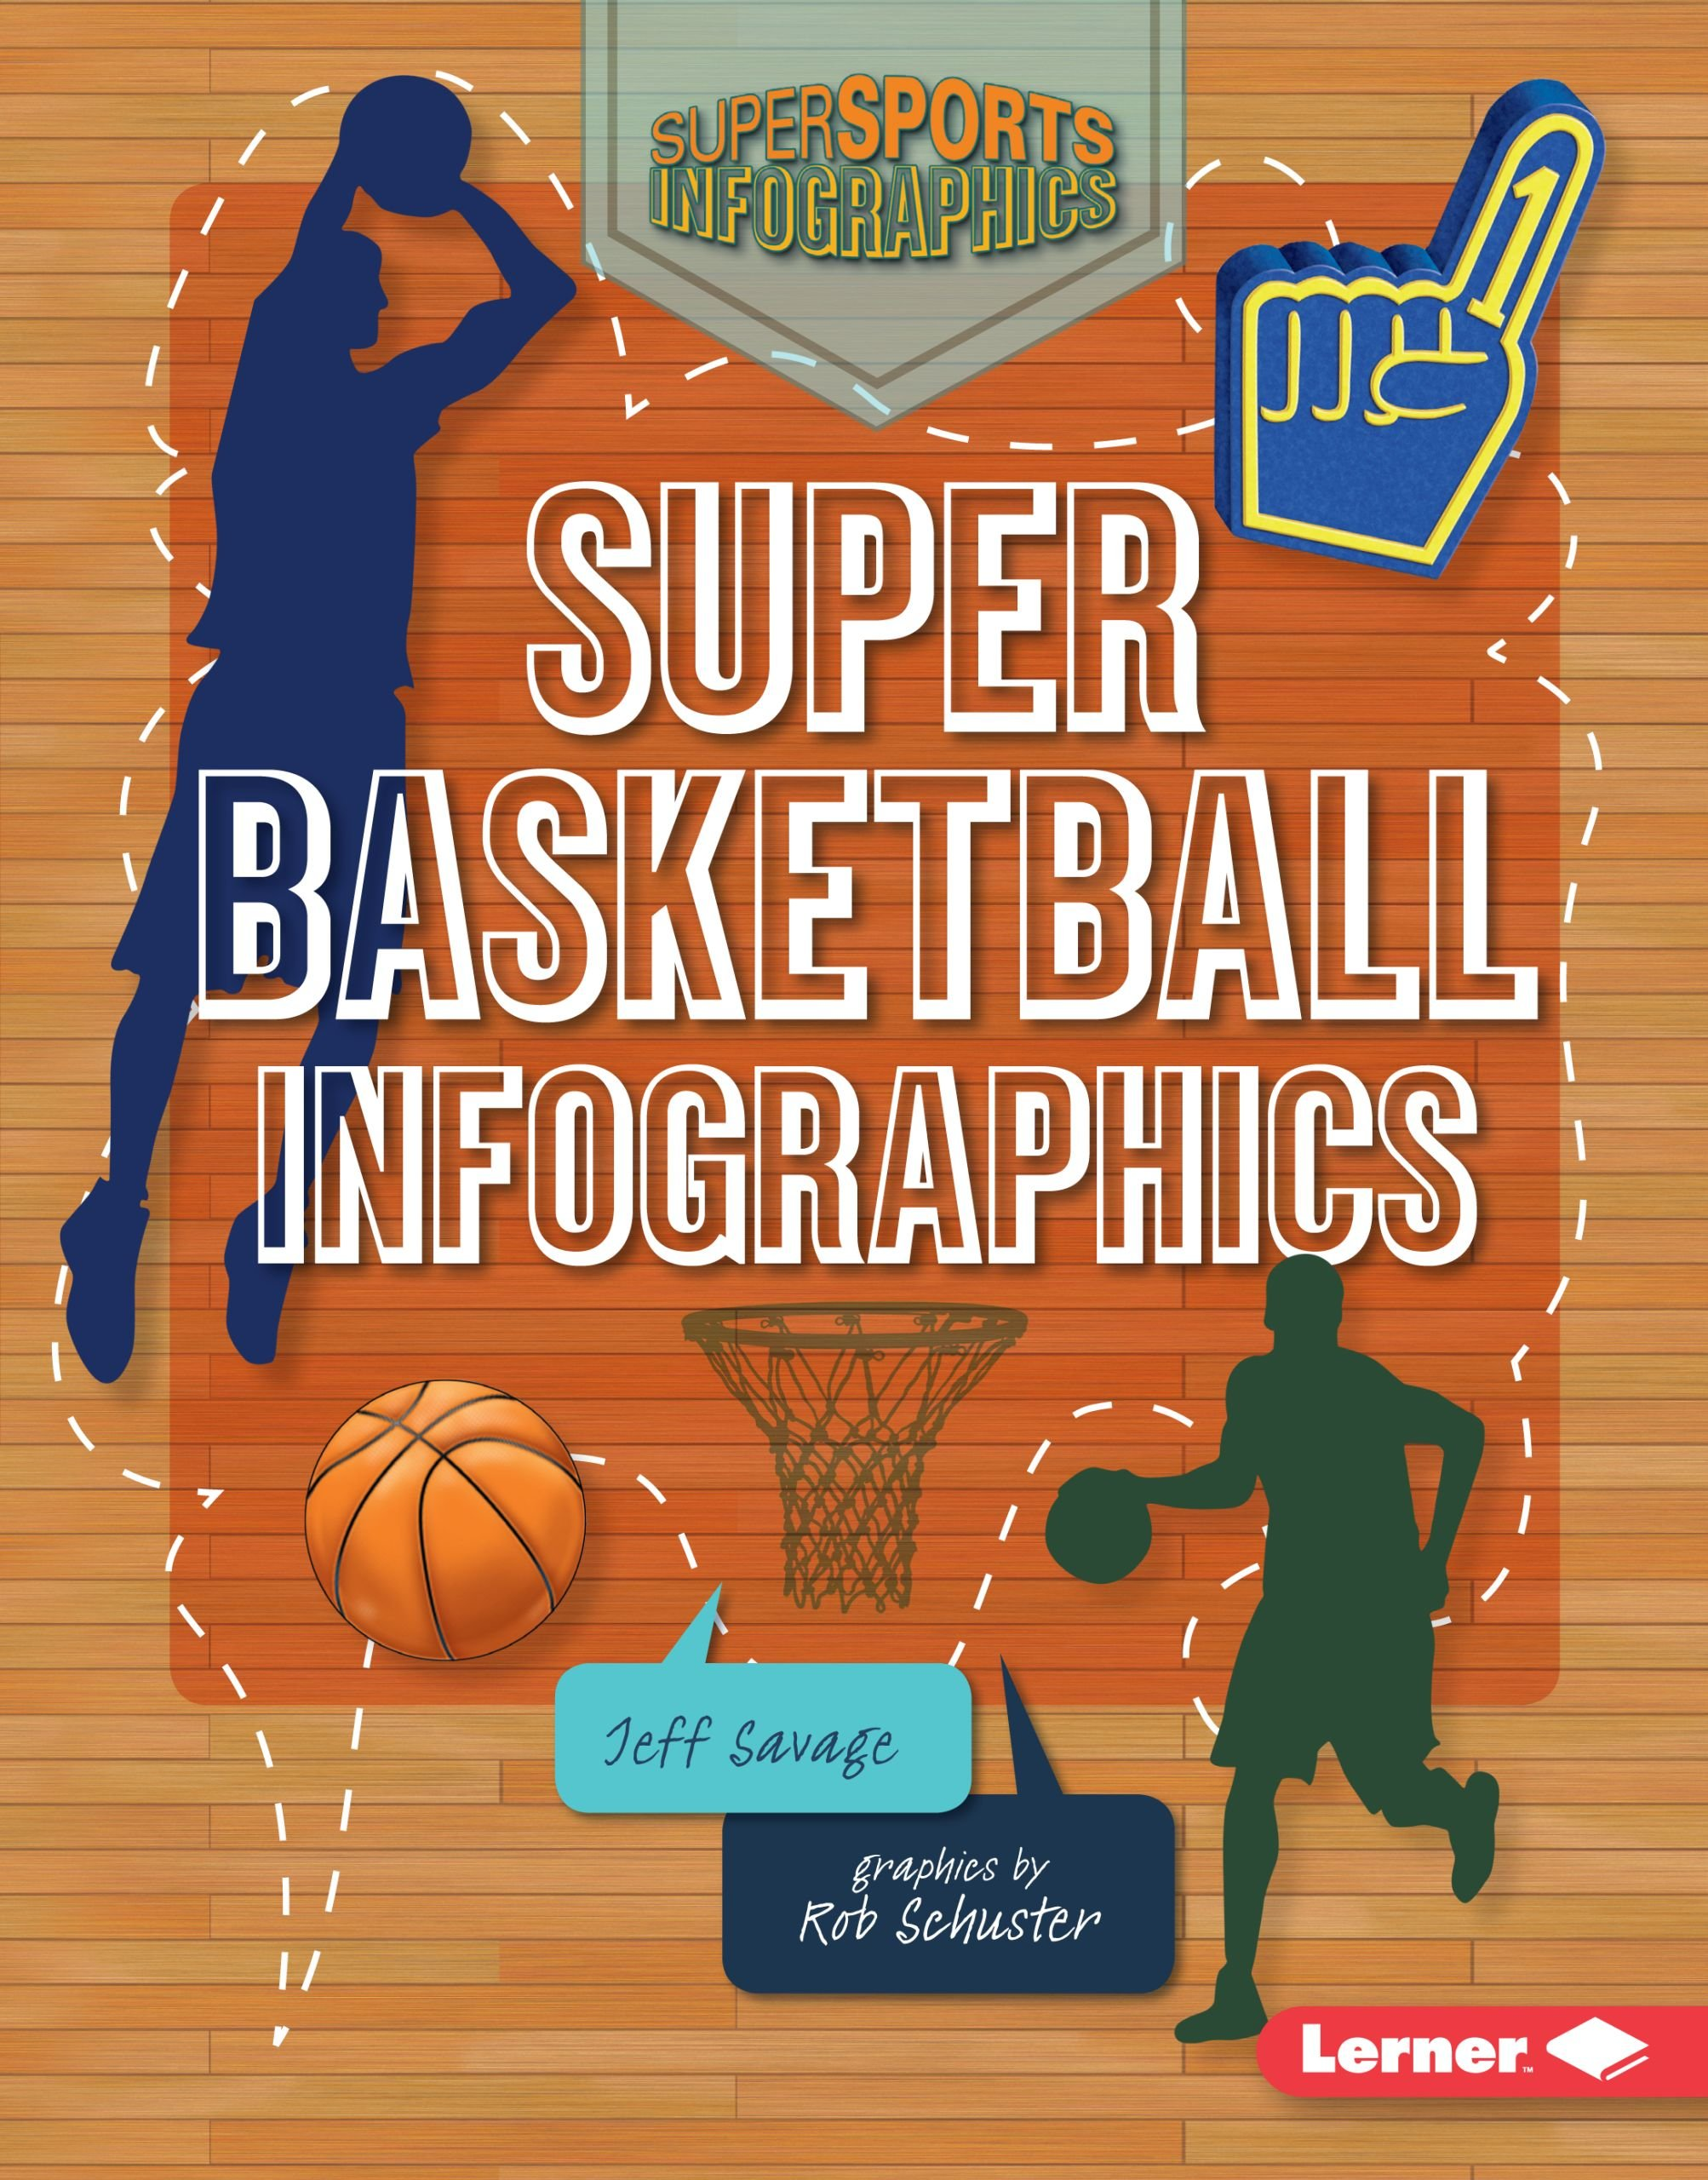 Amazon.com: Super Basketball Infographics (Super Sports ...